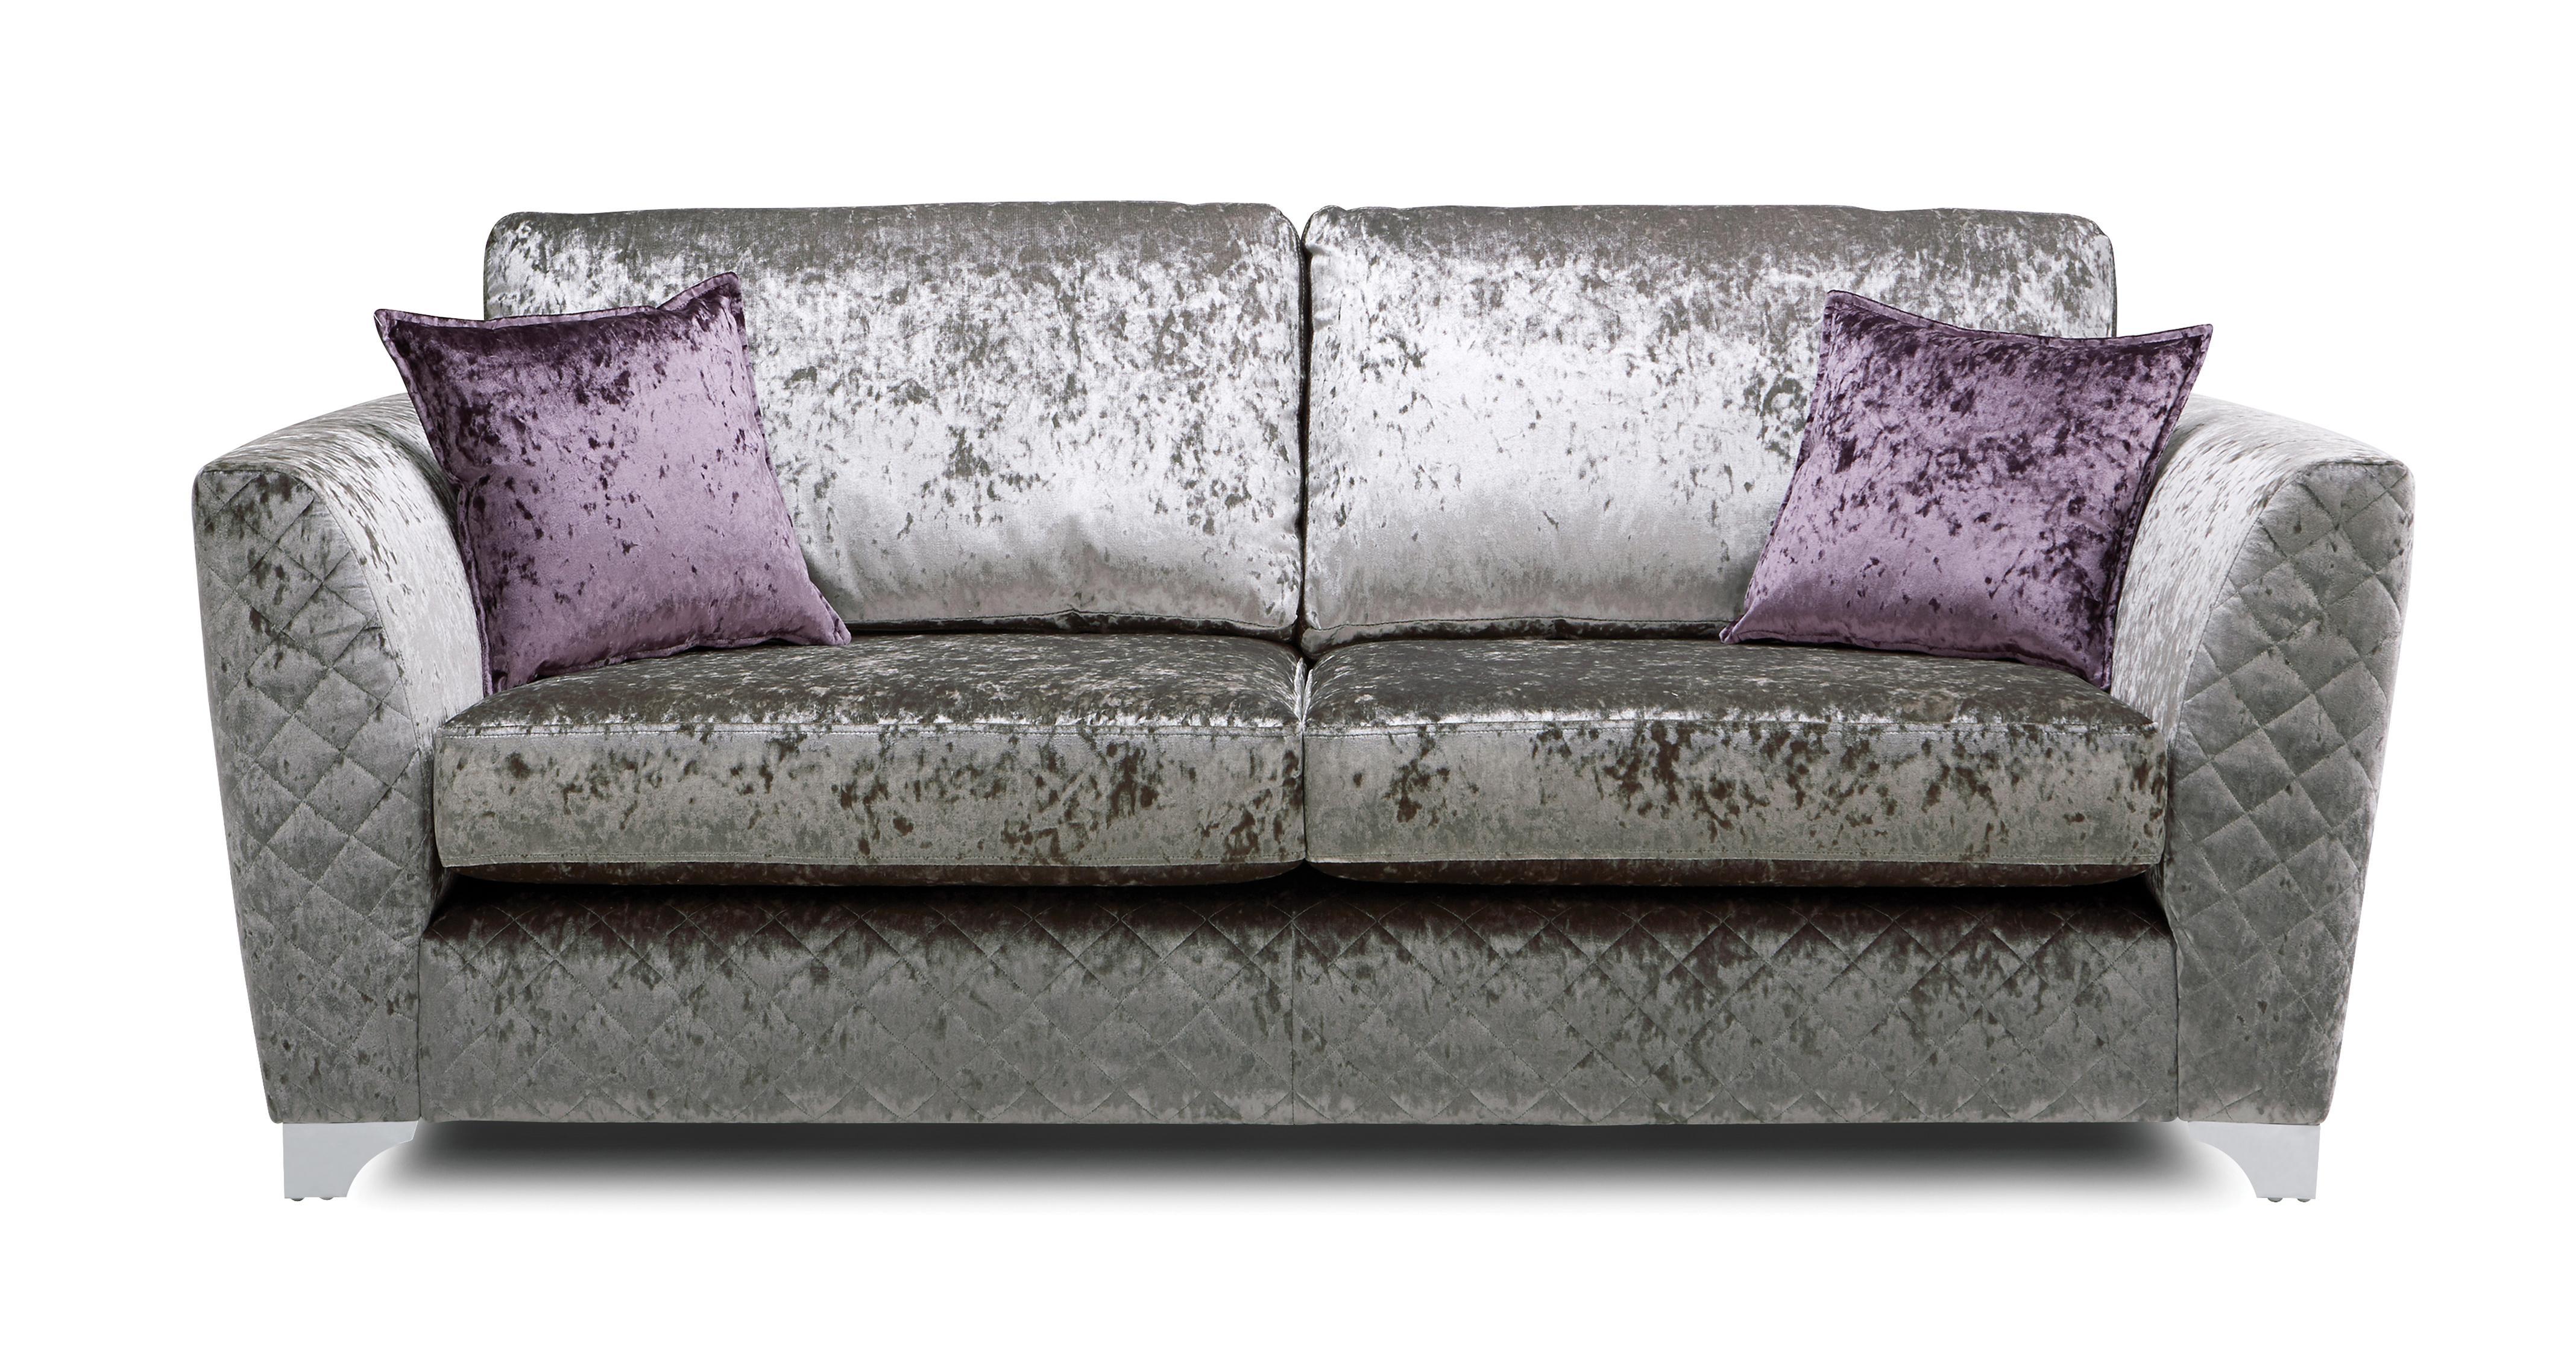 Panache 3 Seater Formal Back Sofa Krystal   DFS